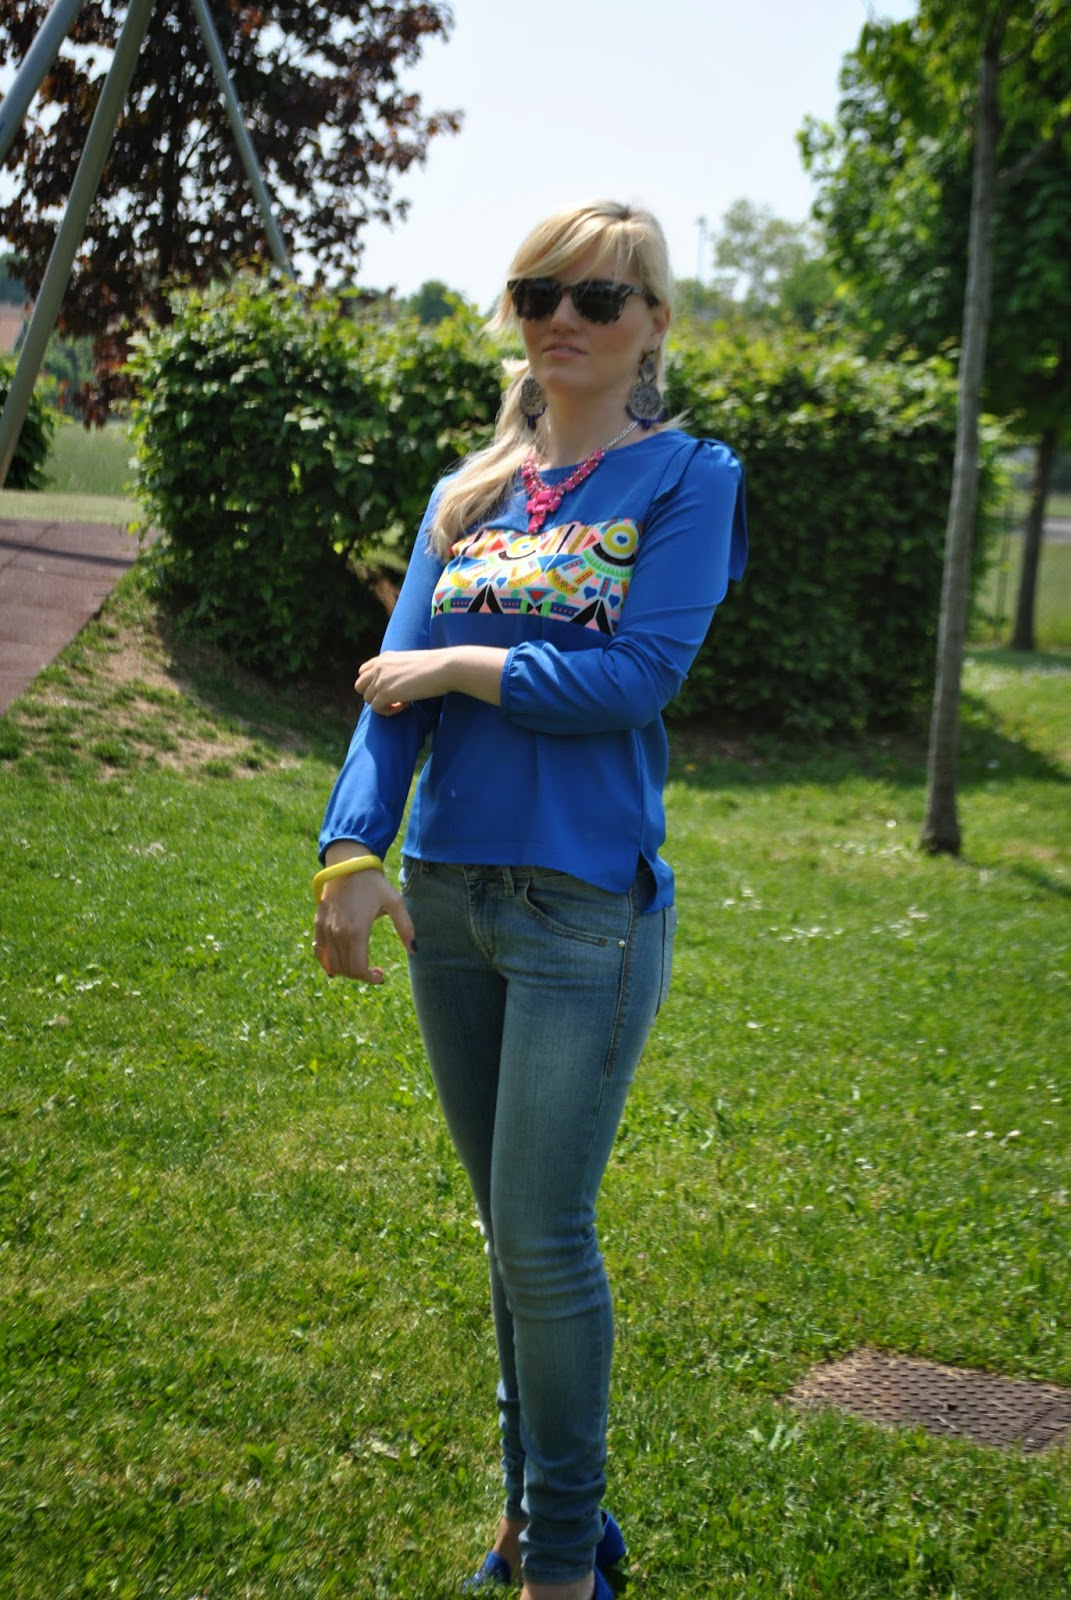 outfit jeans perfect shape fornarina outfit jeans skinny outfit jeans e camicia outfit jeans e camicia blu blusa blu abbinamenti camicia blu outfit persunmall outfit aprile 2014 outfit primaverili occhiali da sole carrera borsa massimiliano incas slippers motivi blu outfit color block fashion blogger italiane milano